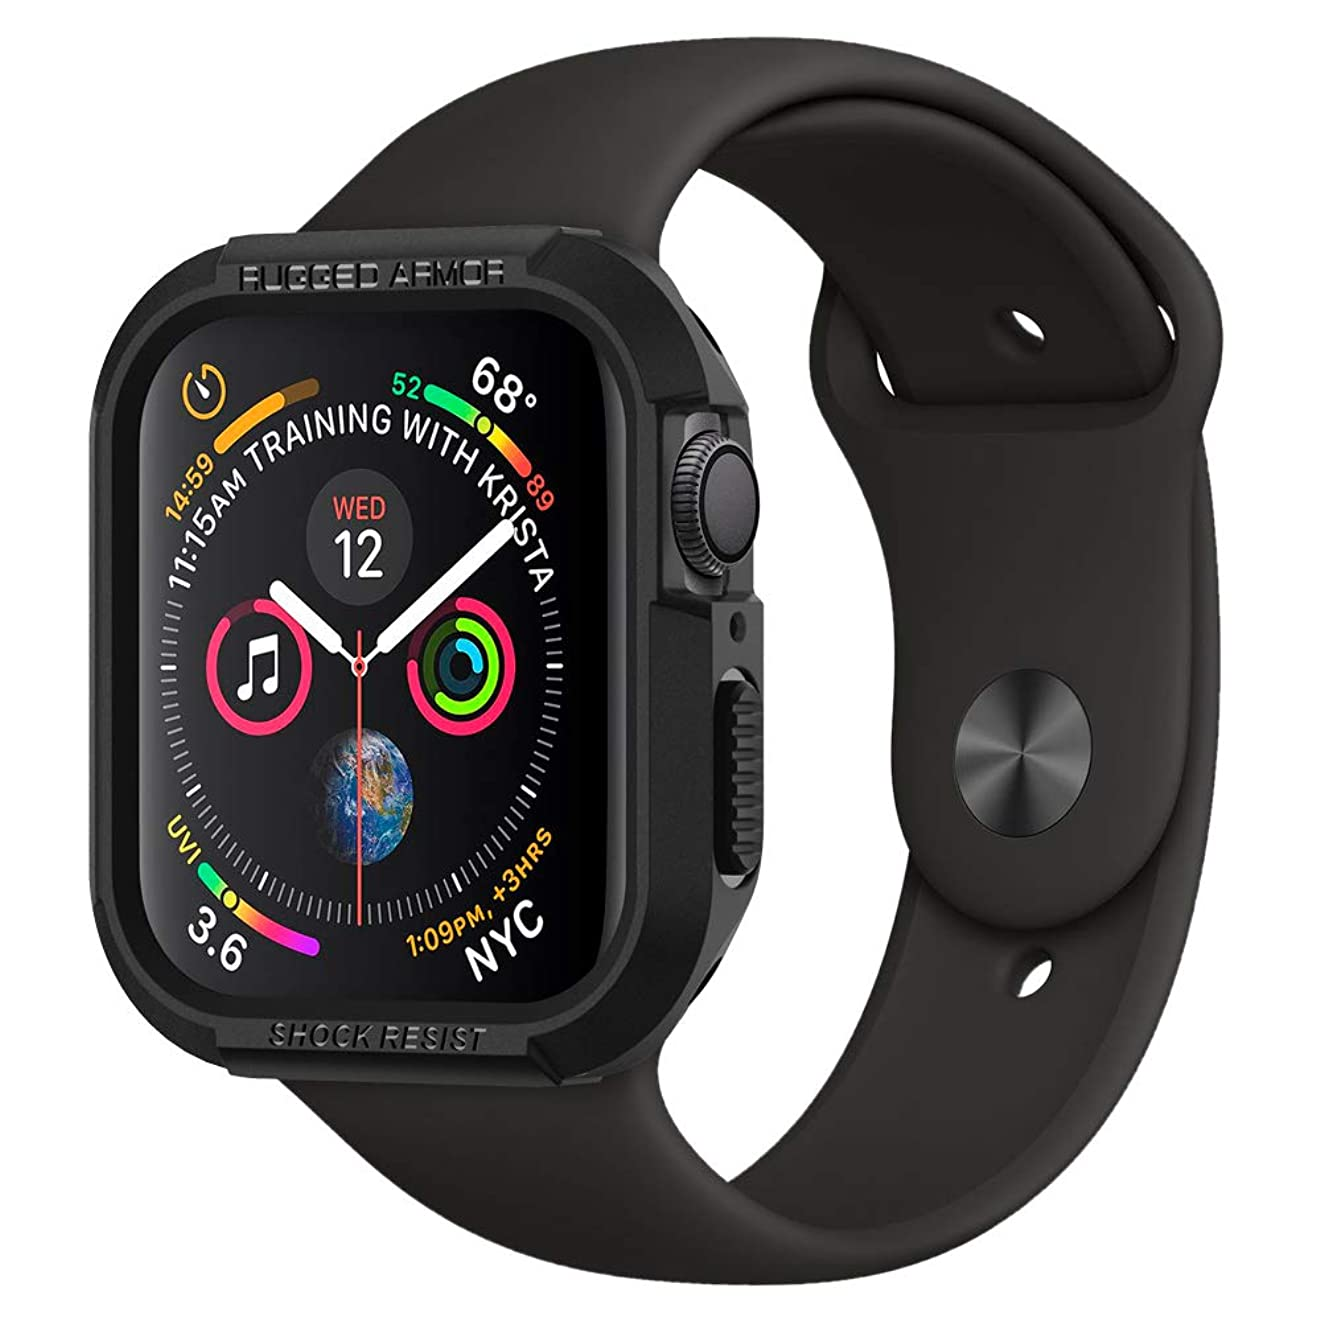 【Spigen】 Apple Watch 40mm ケース 【 Series 5 / series 4 対応 】 落下 衝撃 吸収 タフネスデザイン ラギッド?アーマー 061CS24480 (ブラック)